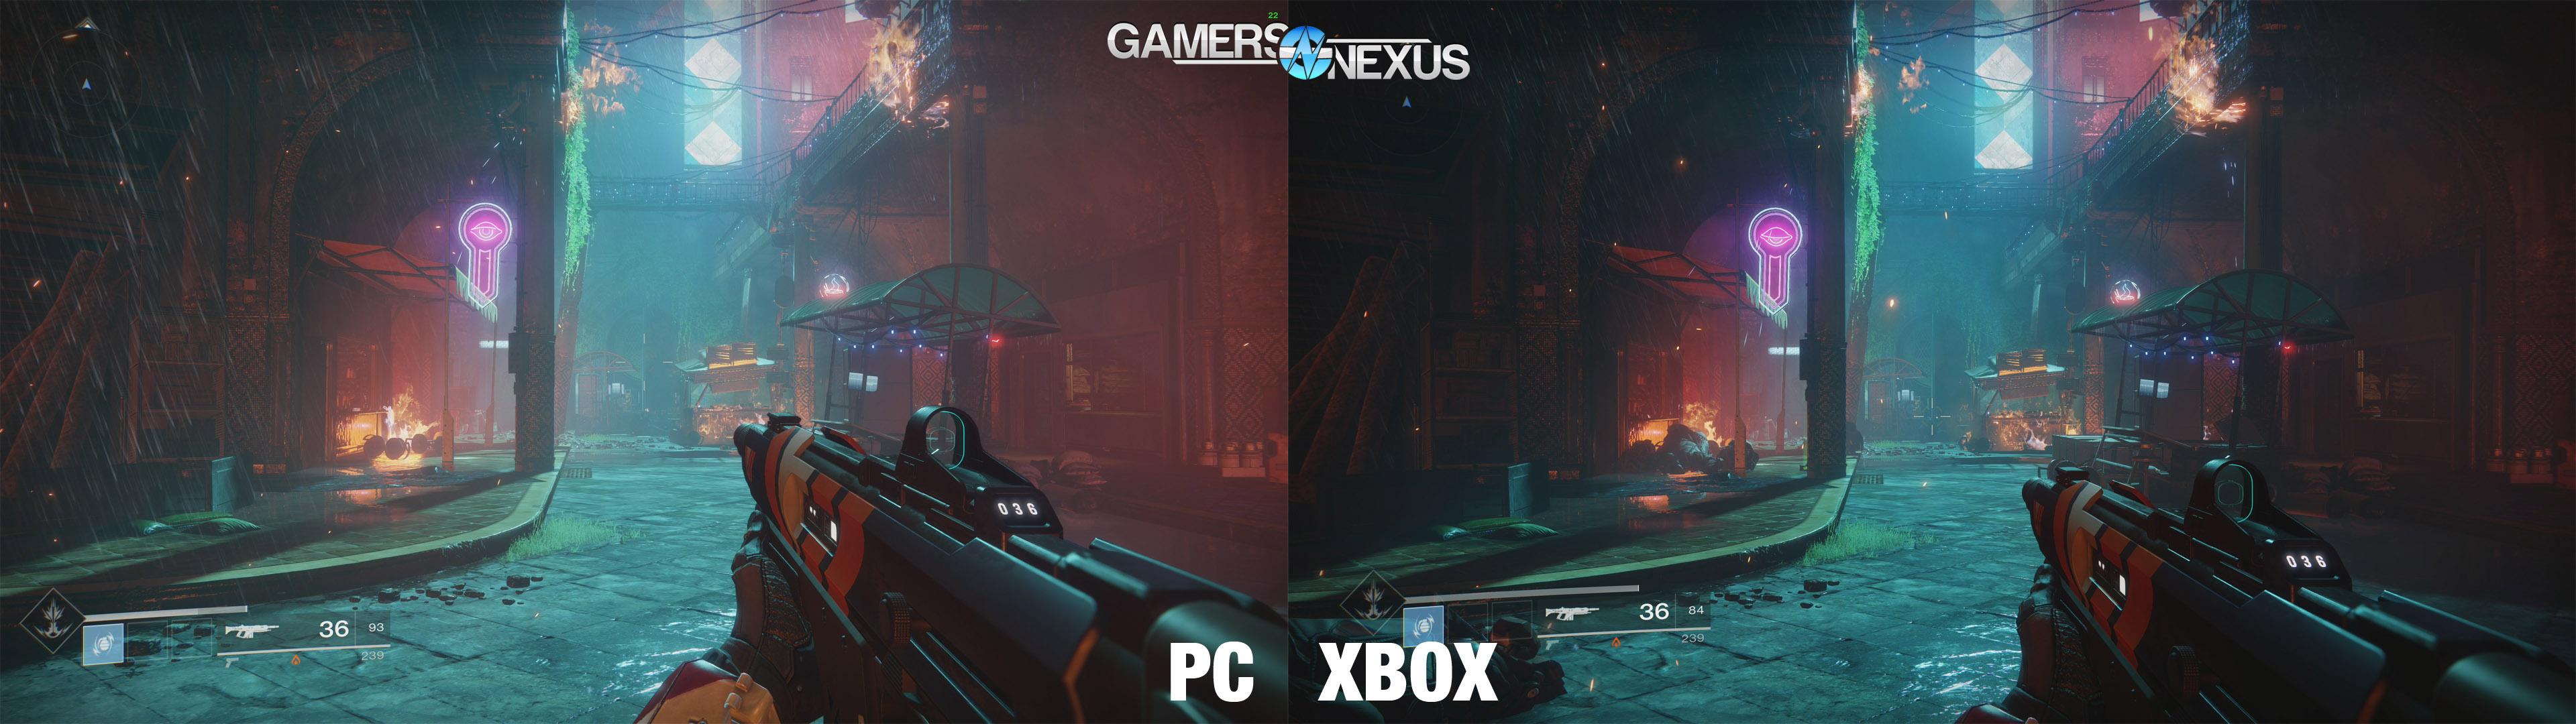 Xbox One X vs  $500 PC - Destiny 2 & Assassin's Creed